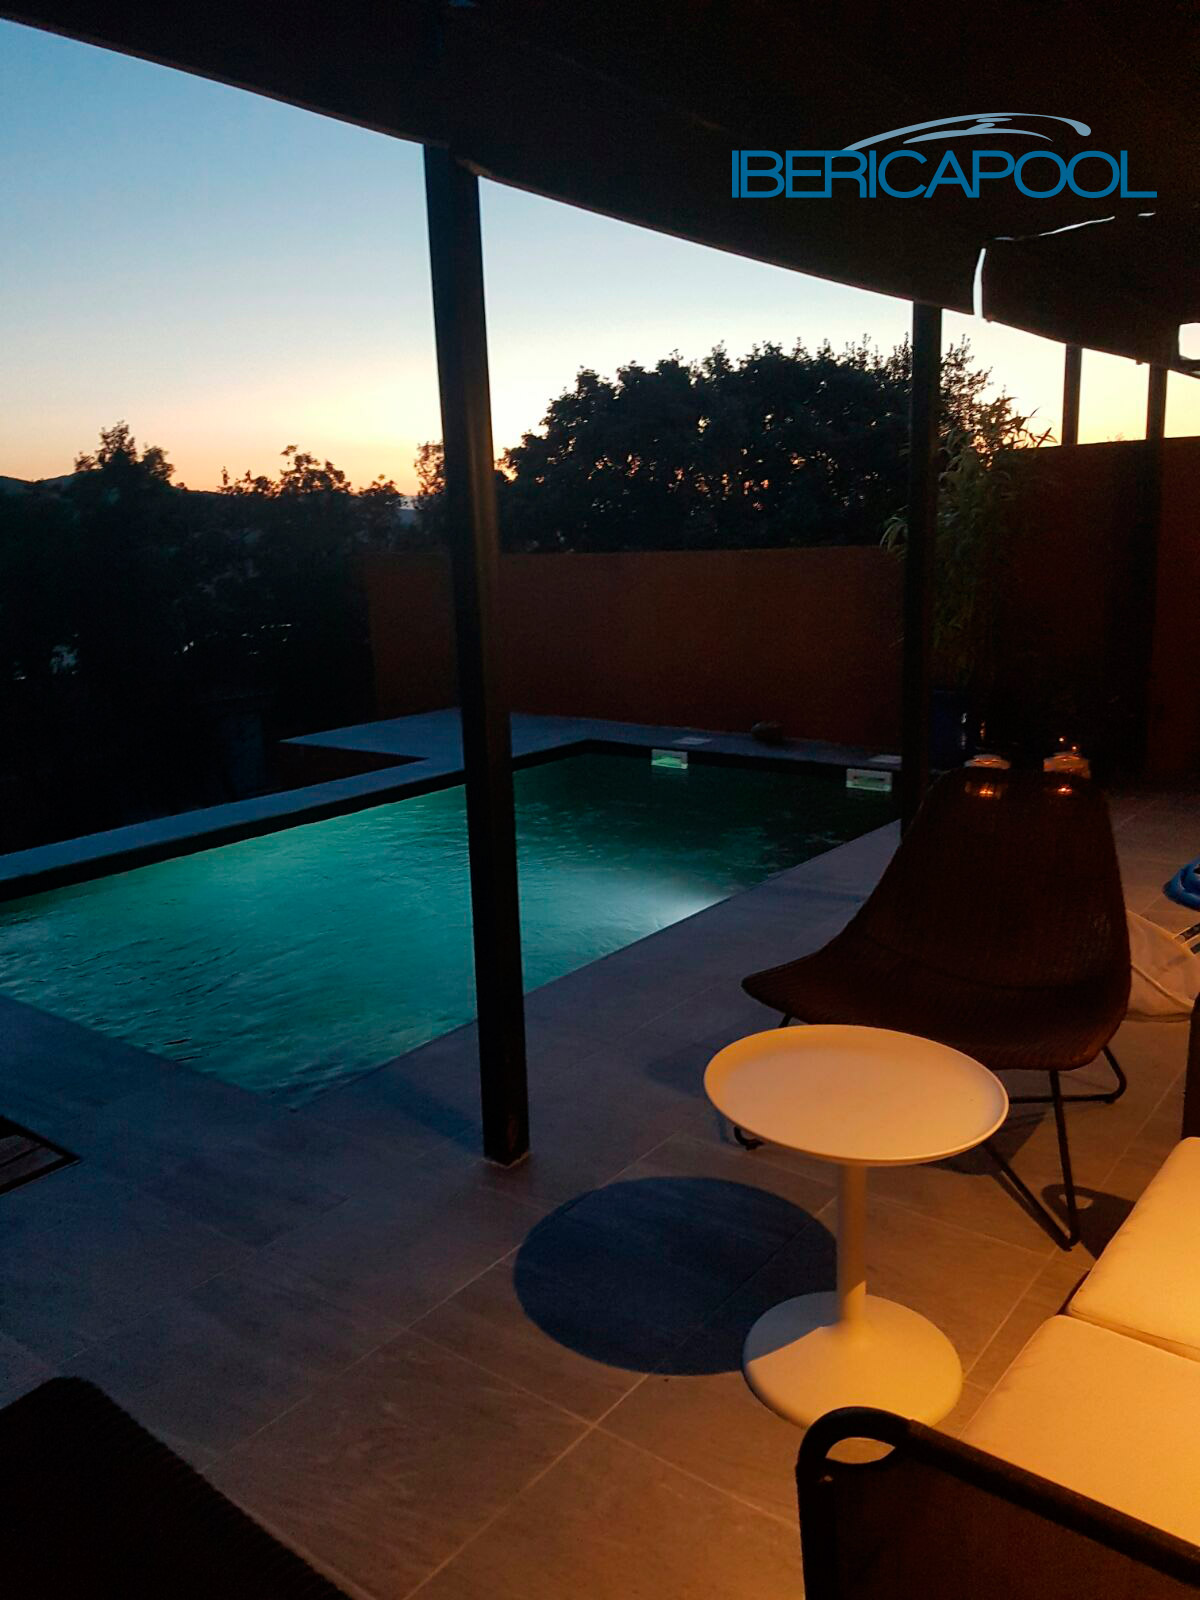 Ibericapool piscina en los ngeles de san rafael for Piscinas en carrefour 2017